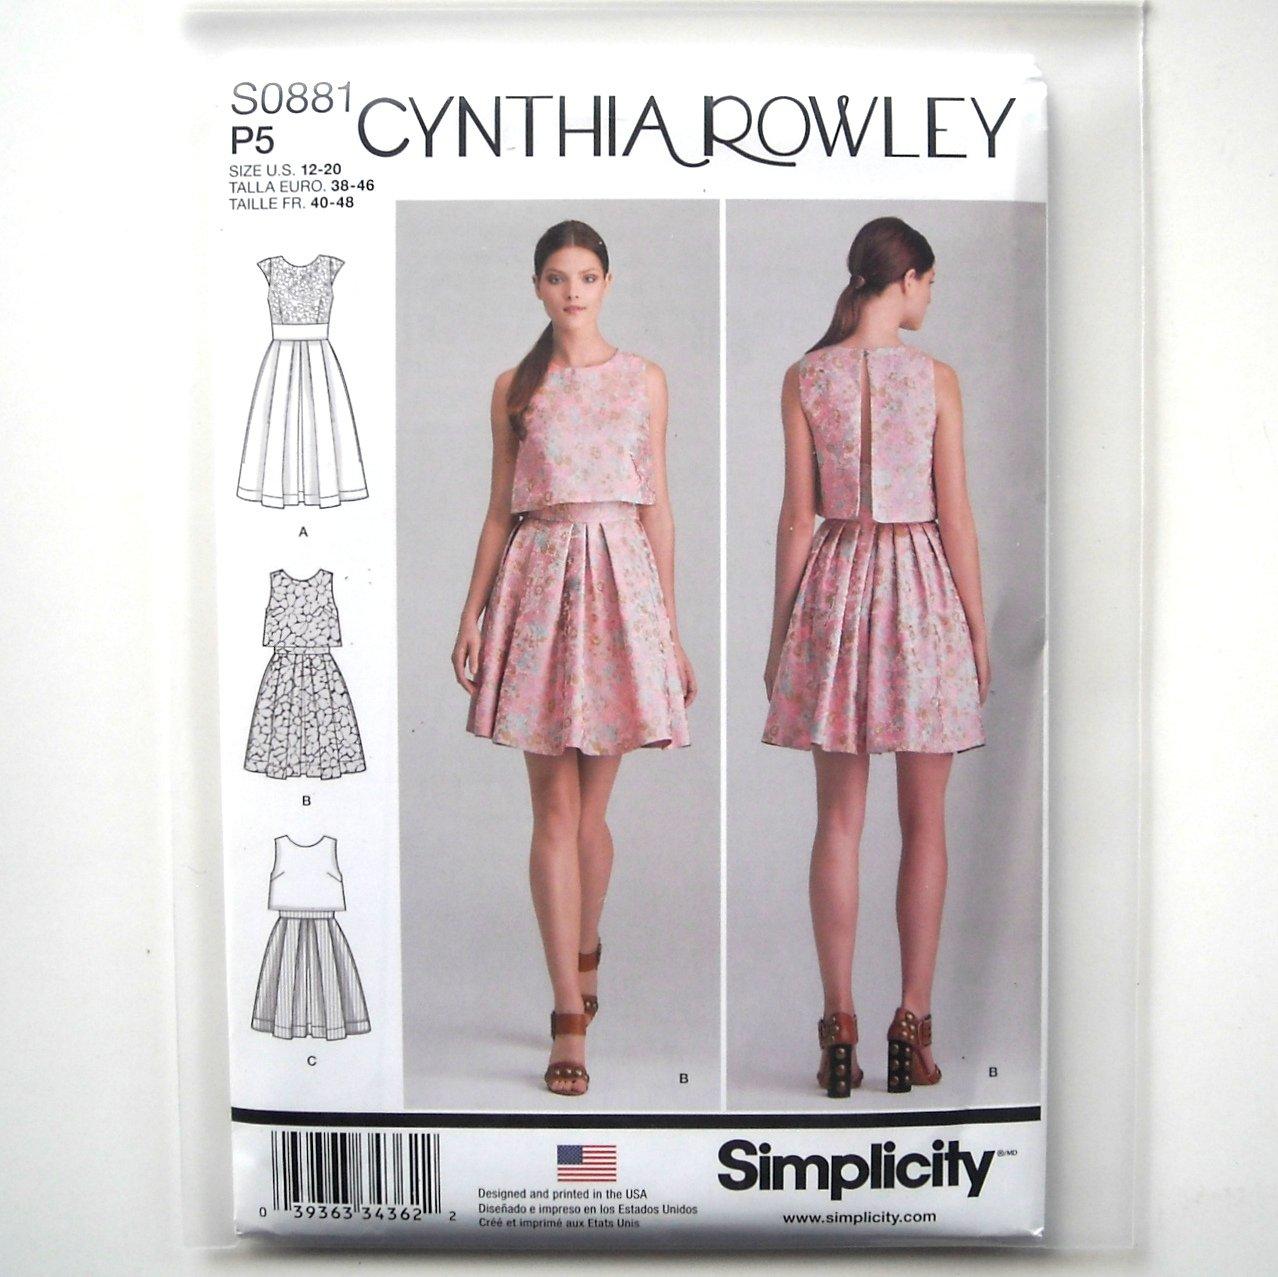 Cynthia Rowley Sewing Patterns: Misses Dress 12 14 16 18 20 Cynthia Rowley Simplicity